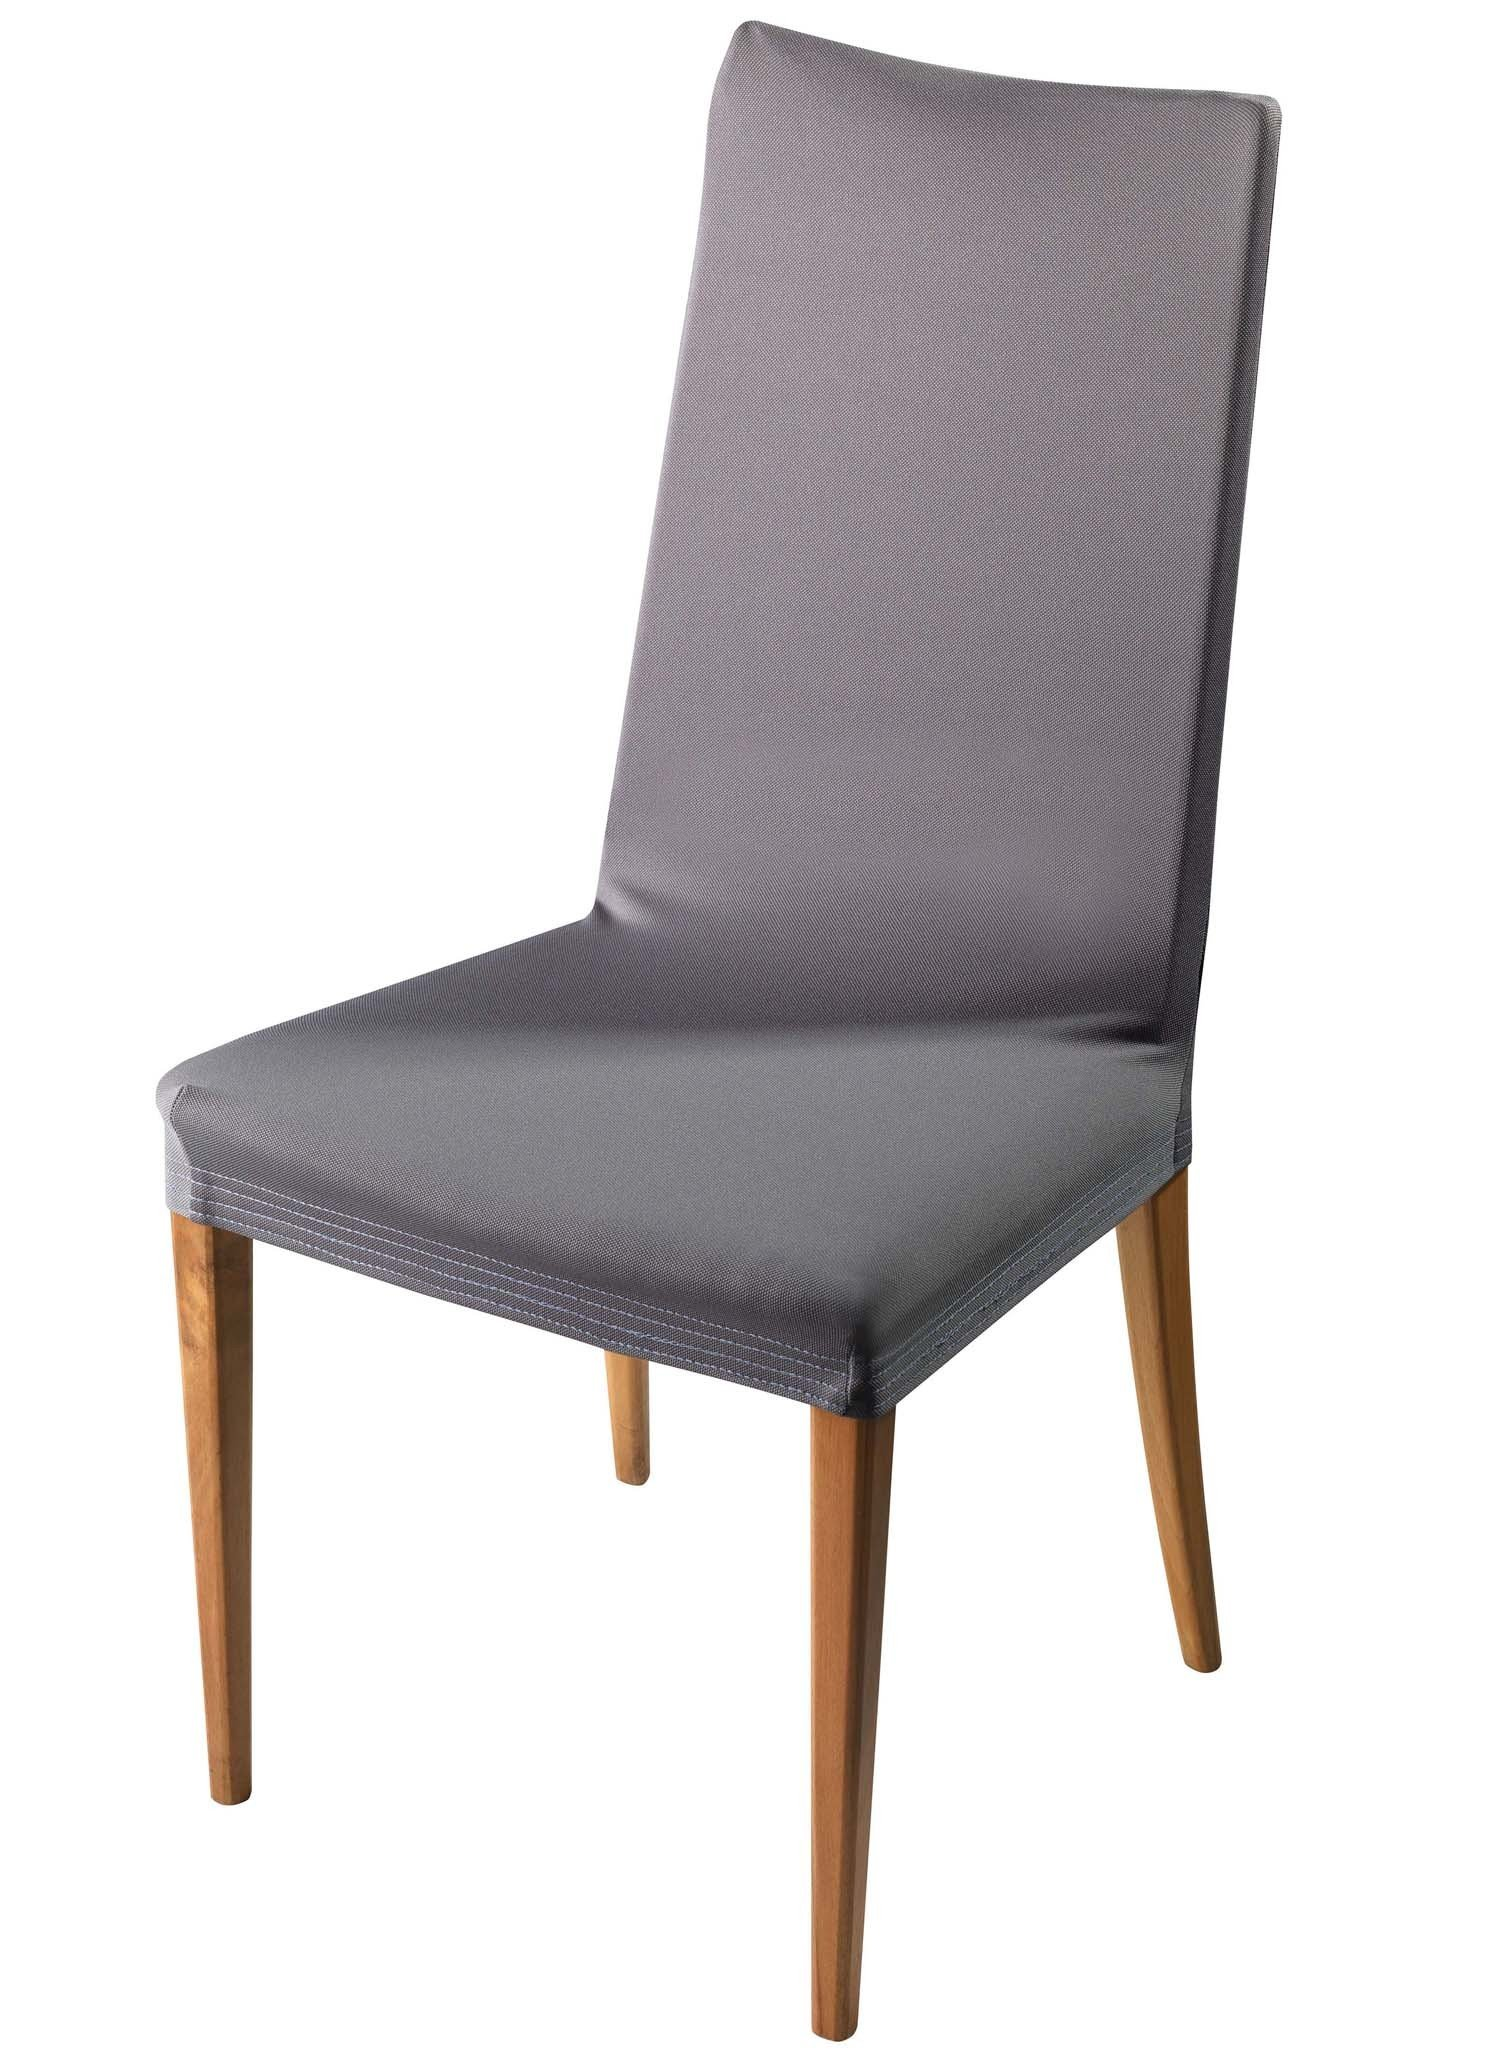 Schonbezug,Stühle grau 2St. - 1 - Ronja.ch